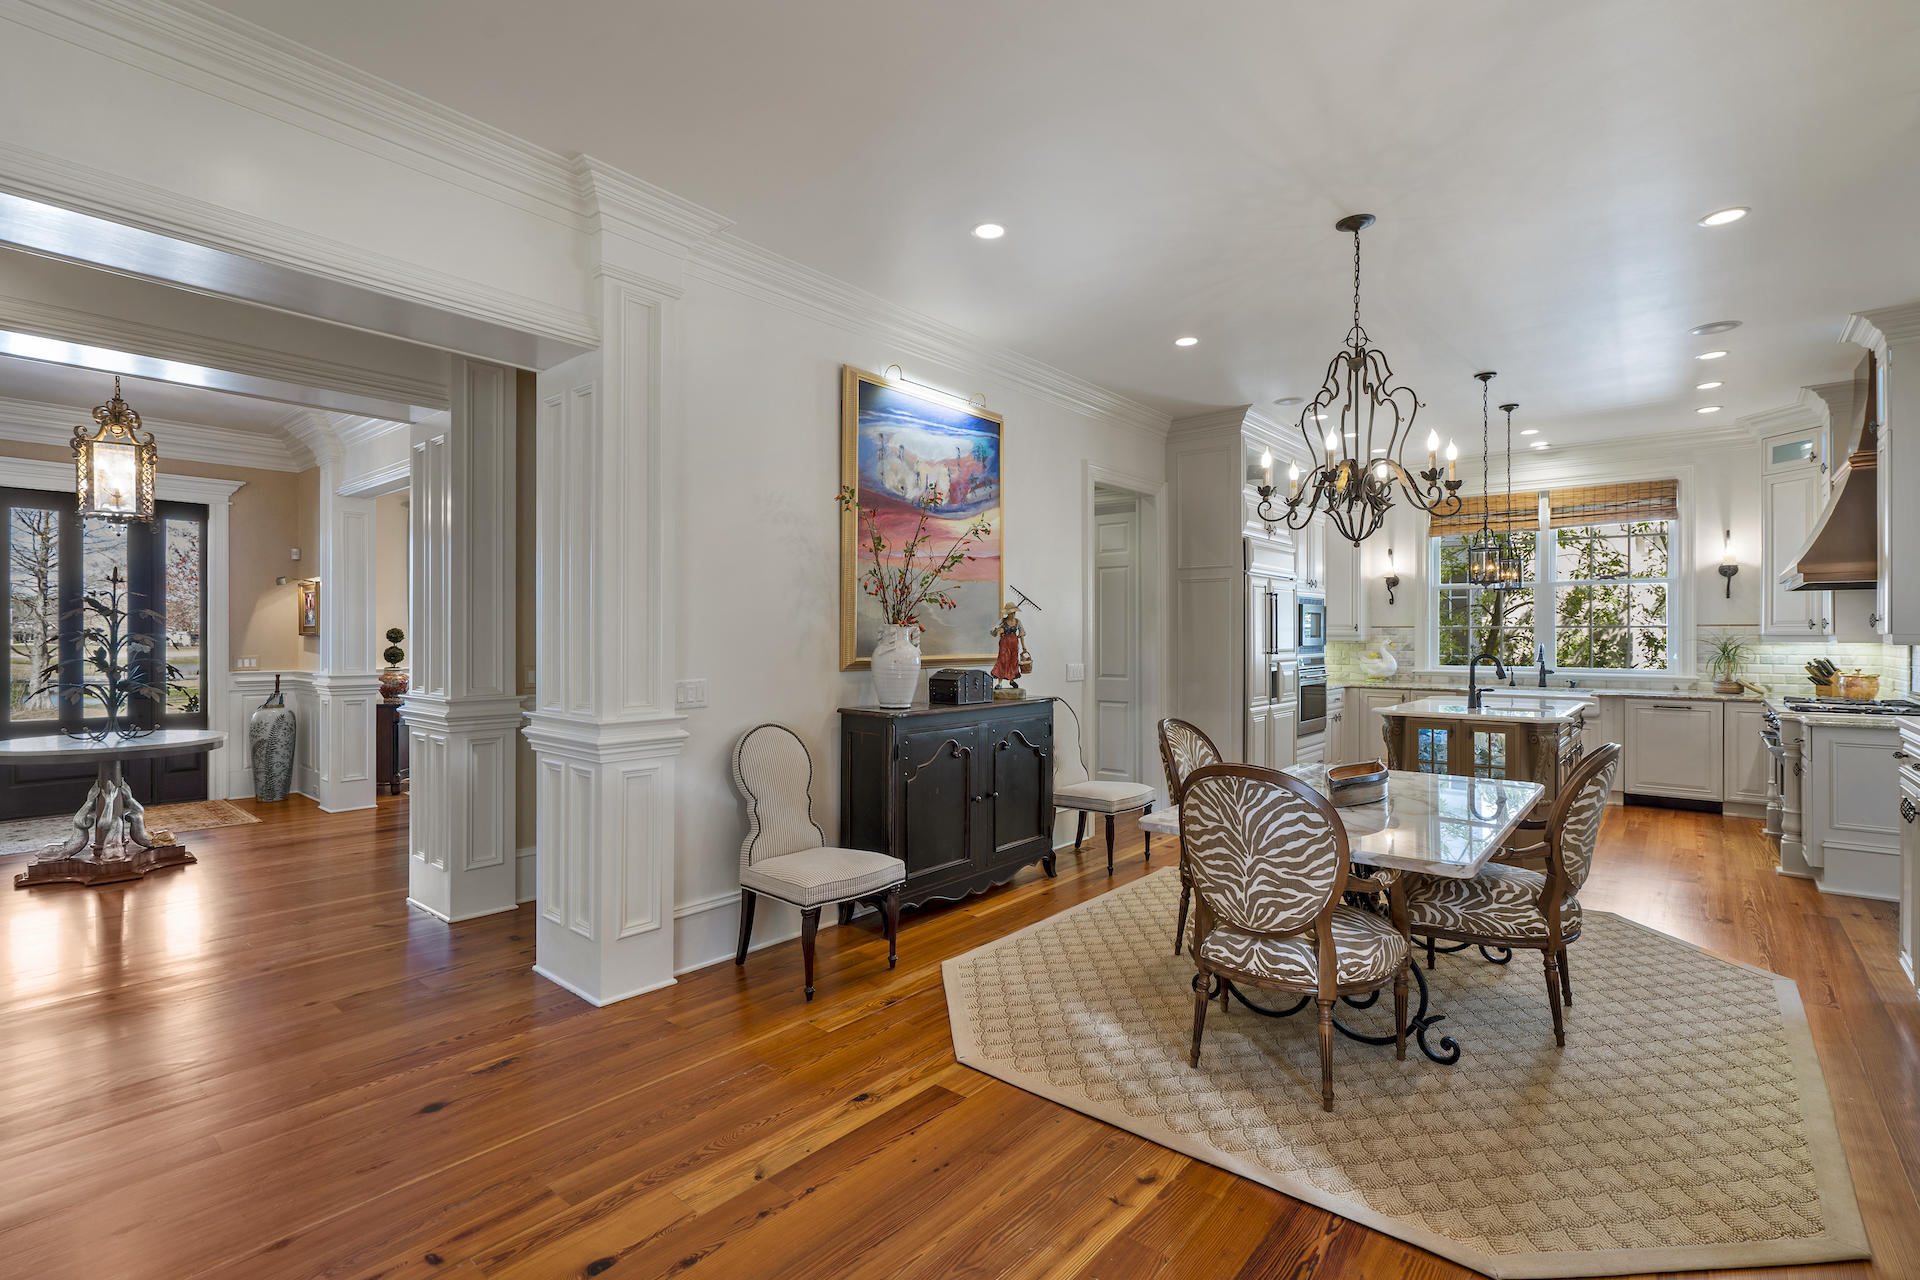 Daniel Island Homes For Sale - 623 Island Park, Charleston, SC - 34